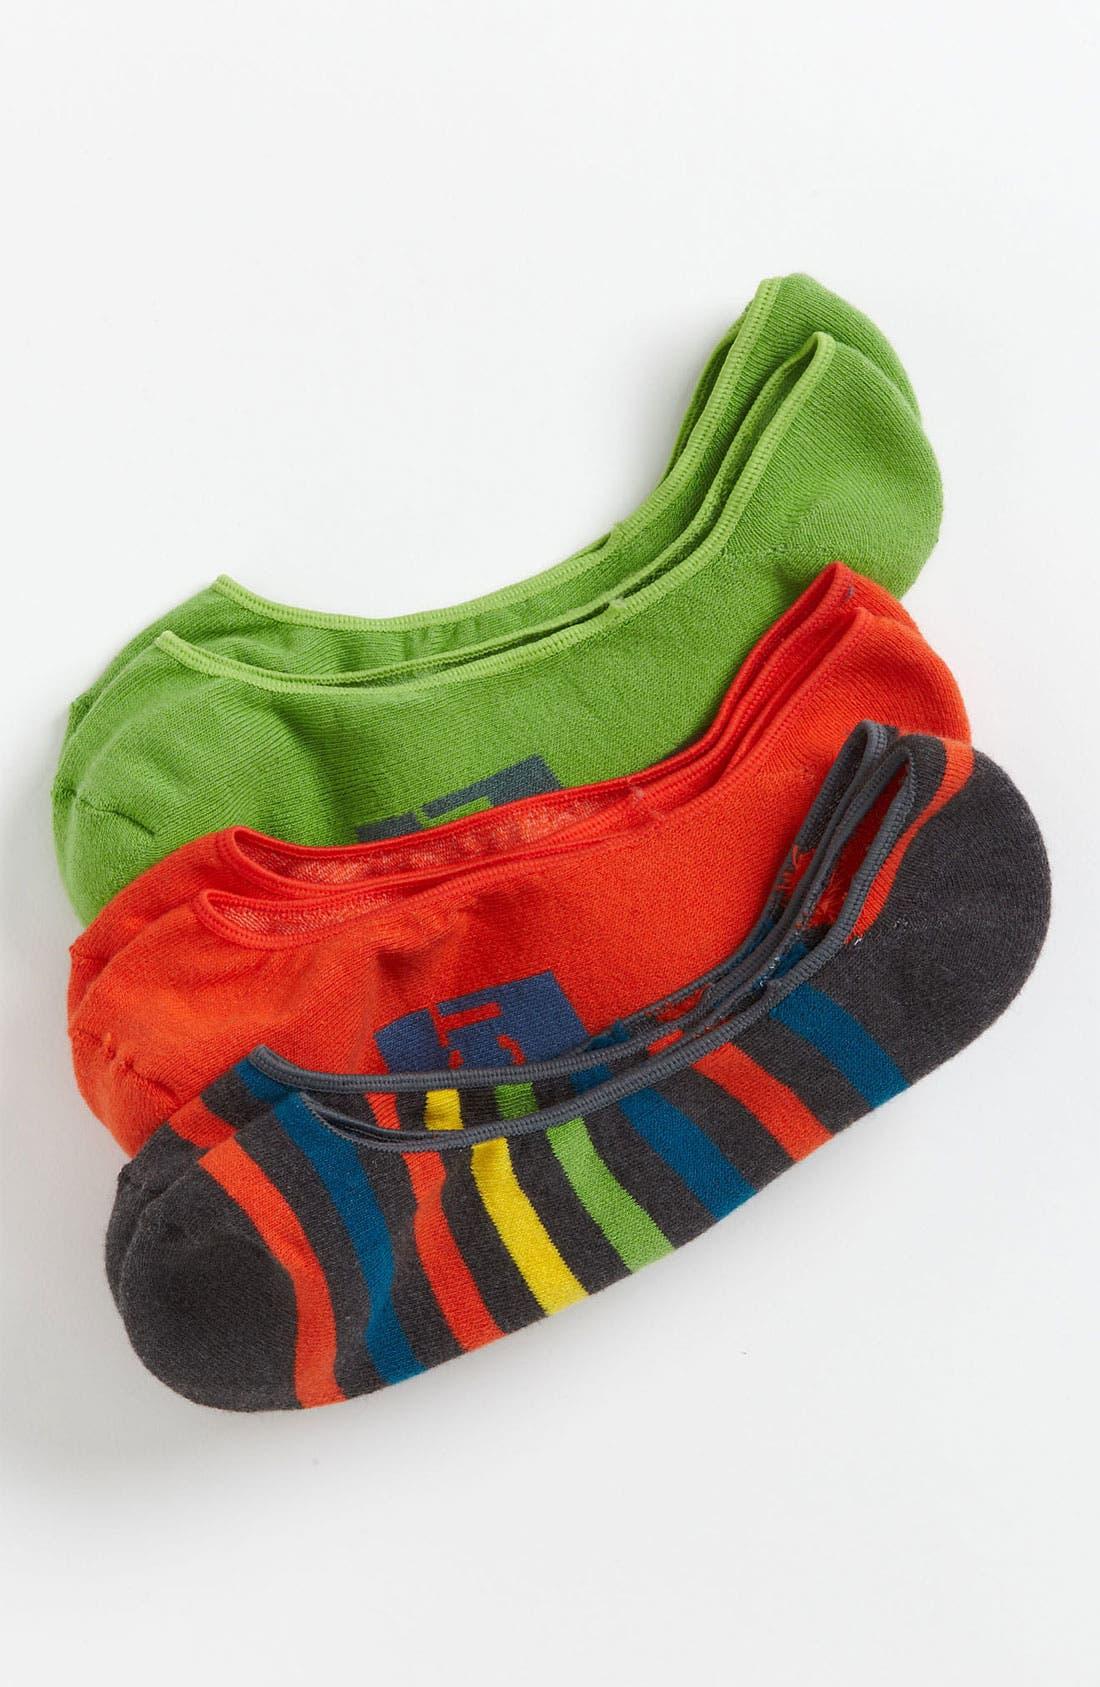 PACT 'Farm' No-Show Socks, Main, color, 999